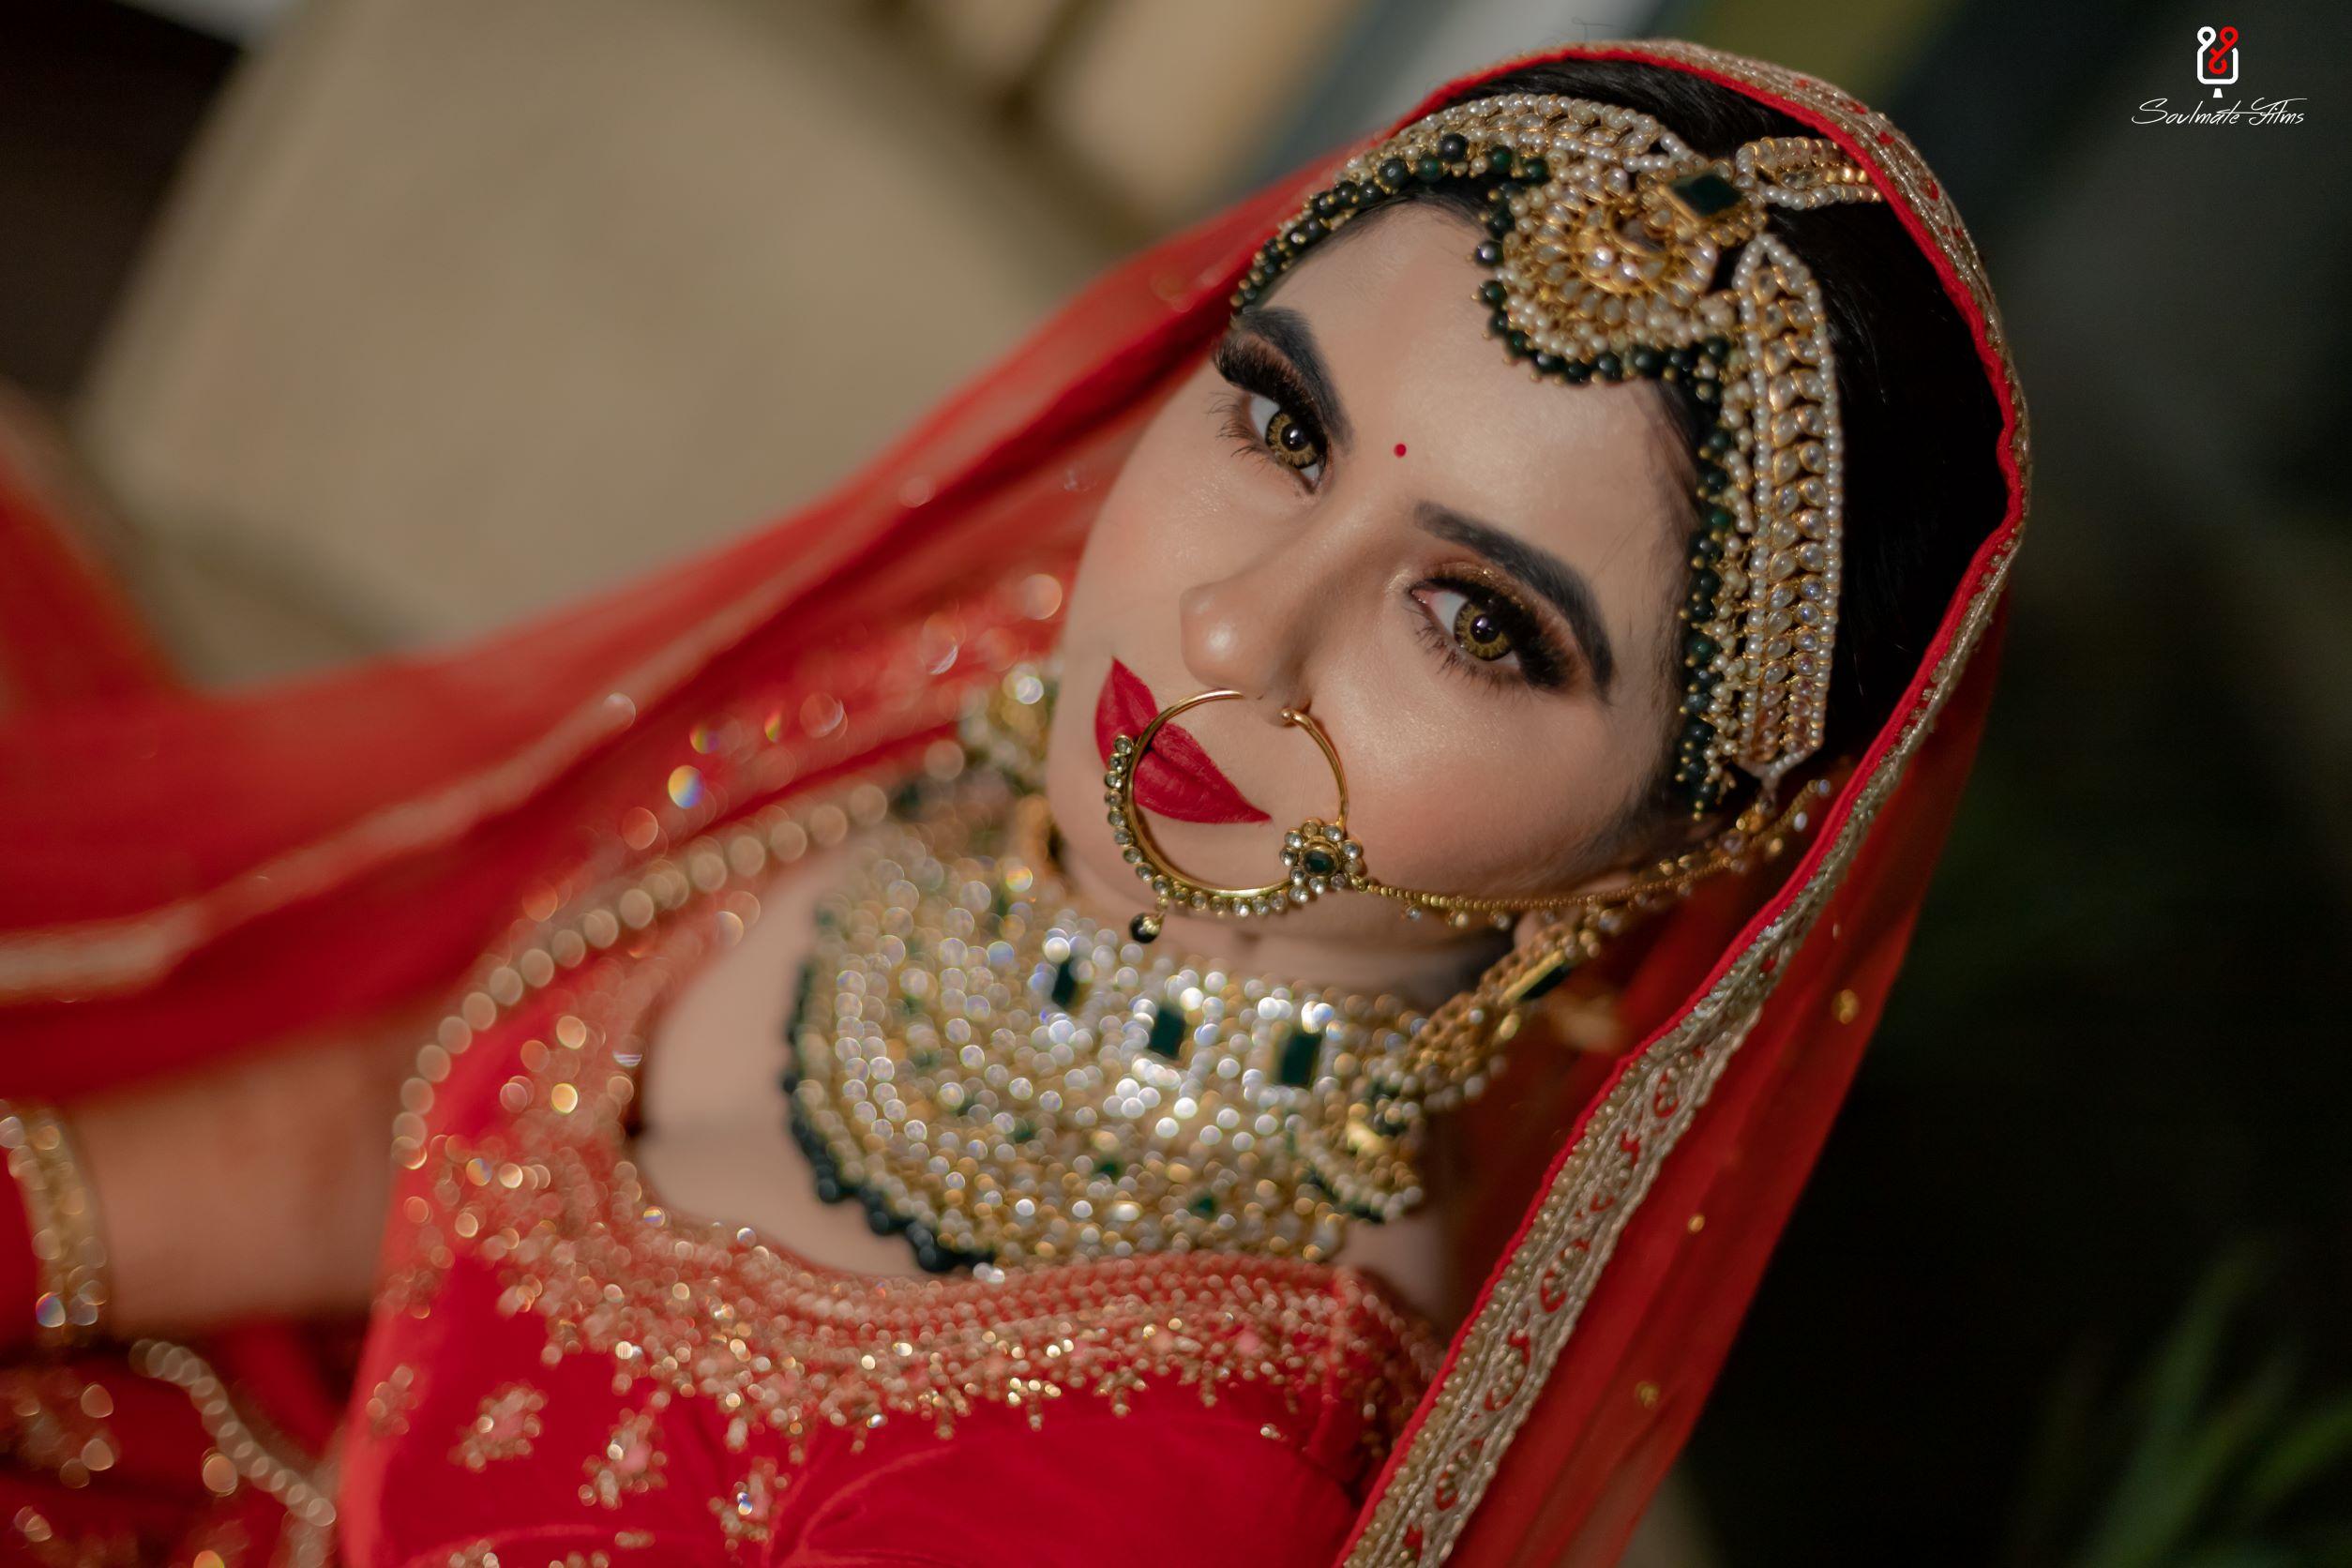 bride in red bridal lehenga and contrasting bridal jewellery